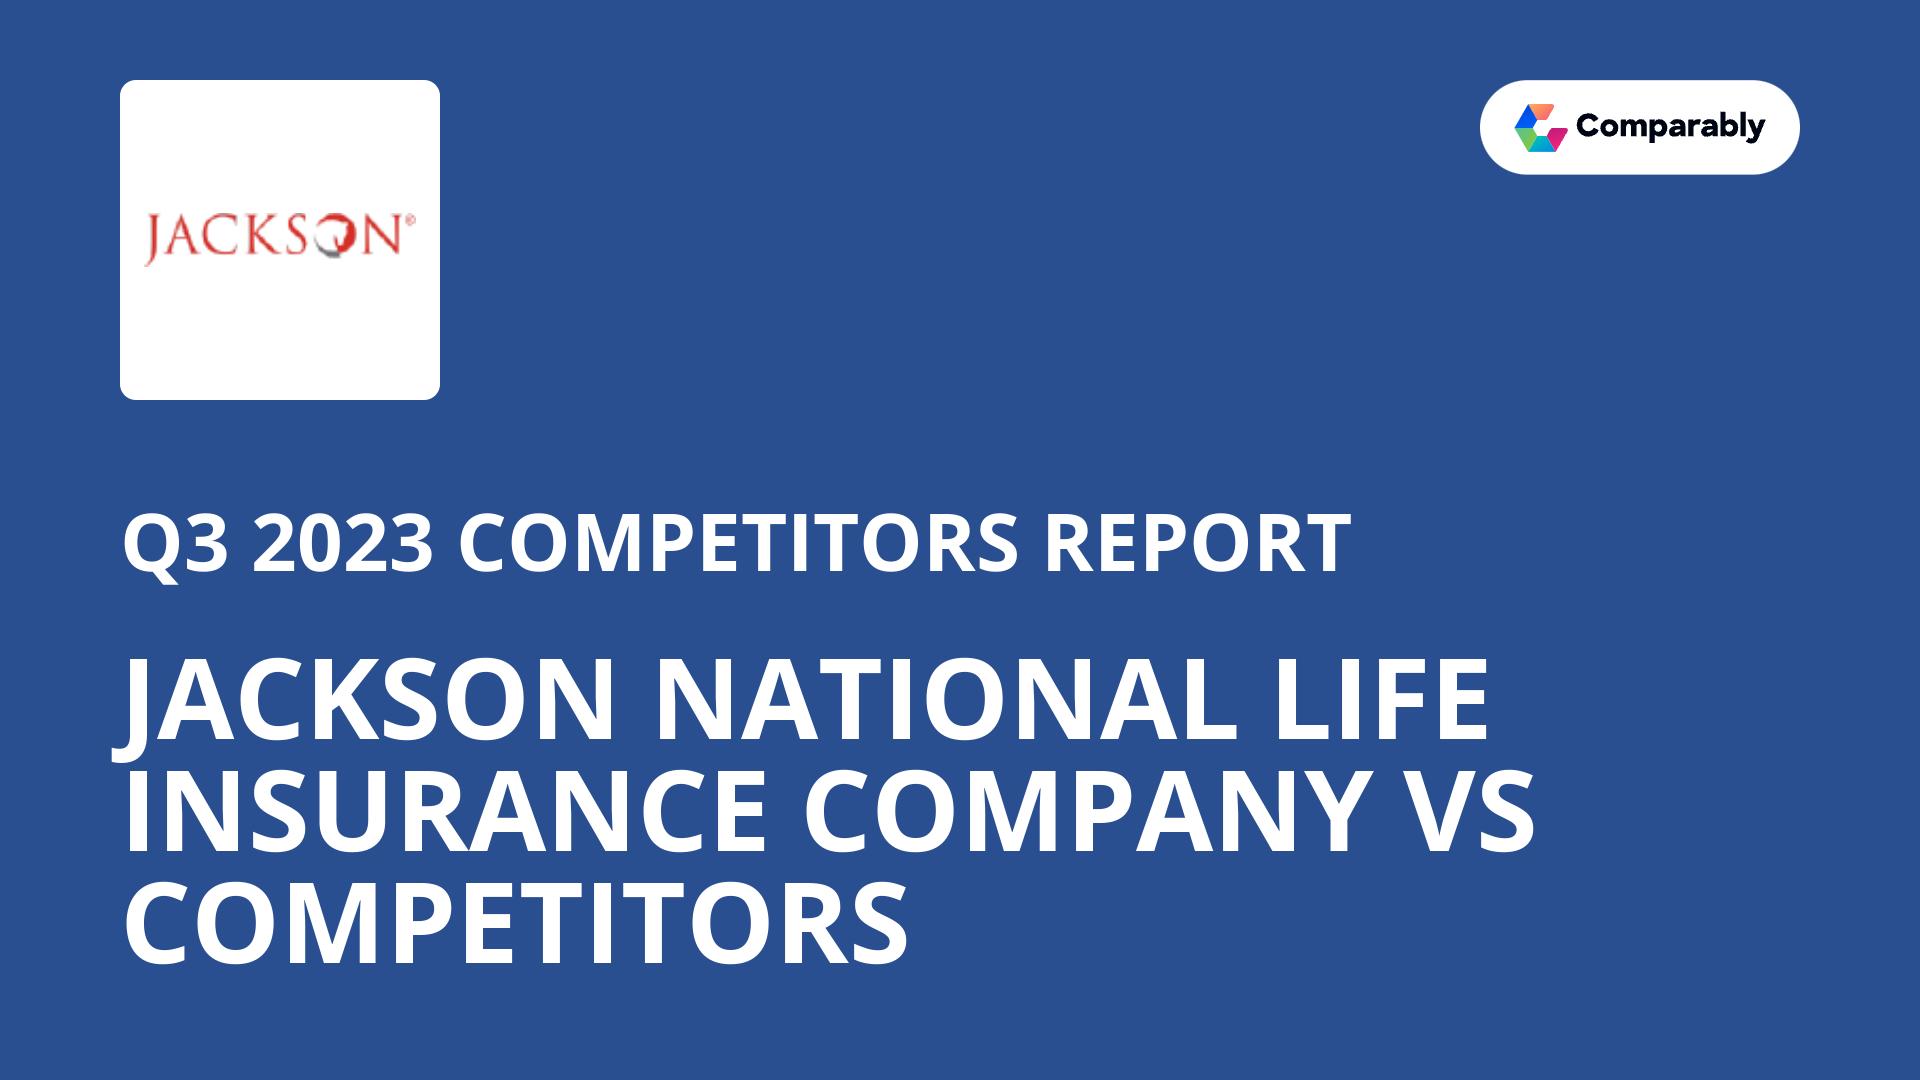 Jackson National Life Insurance Company Competitors Comparably